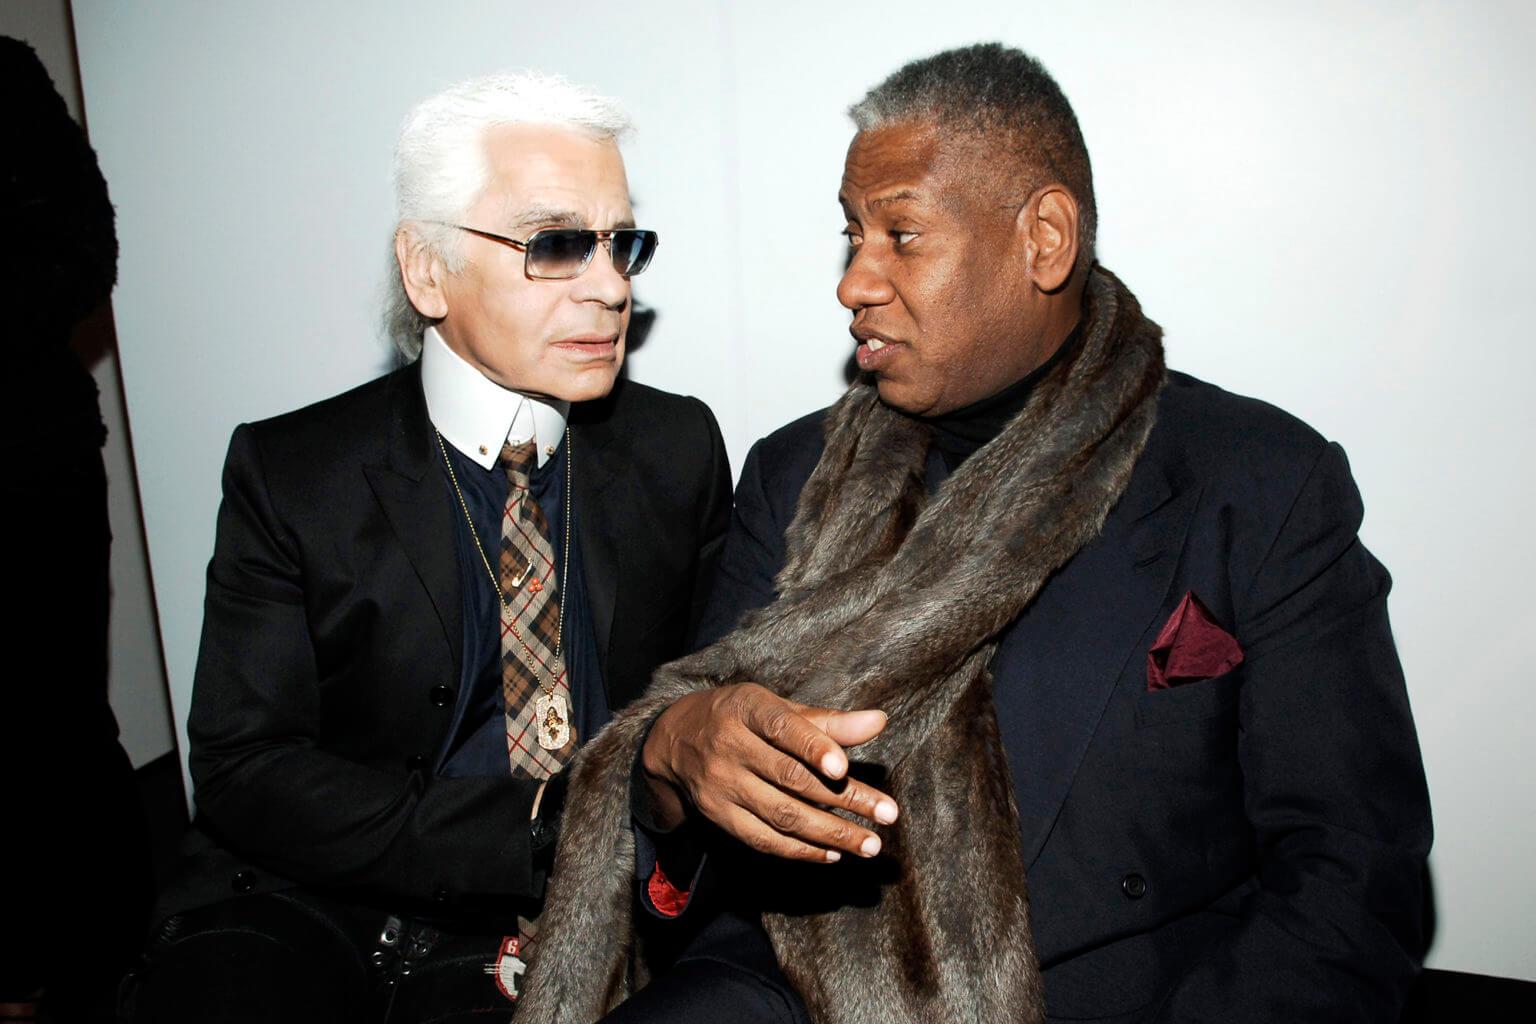 André Leon Talley與已故Karl Lagerfeld曾是摯友。